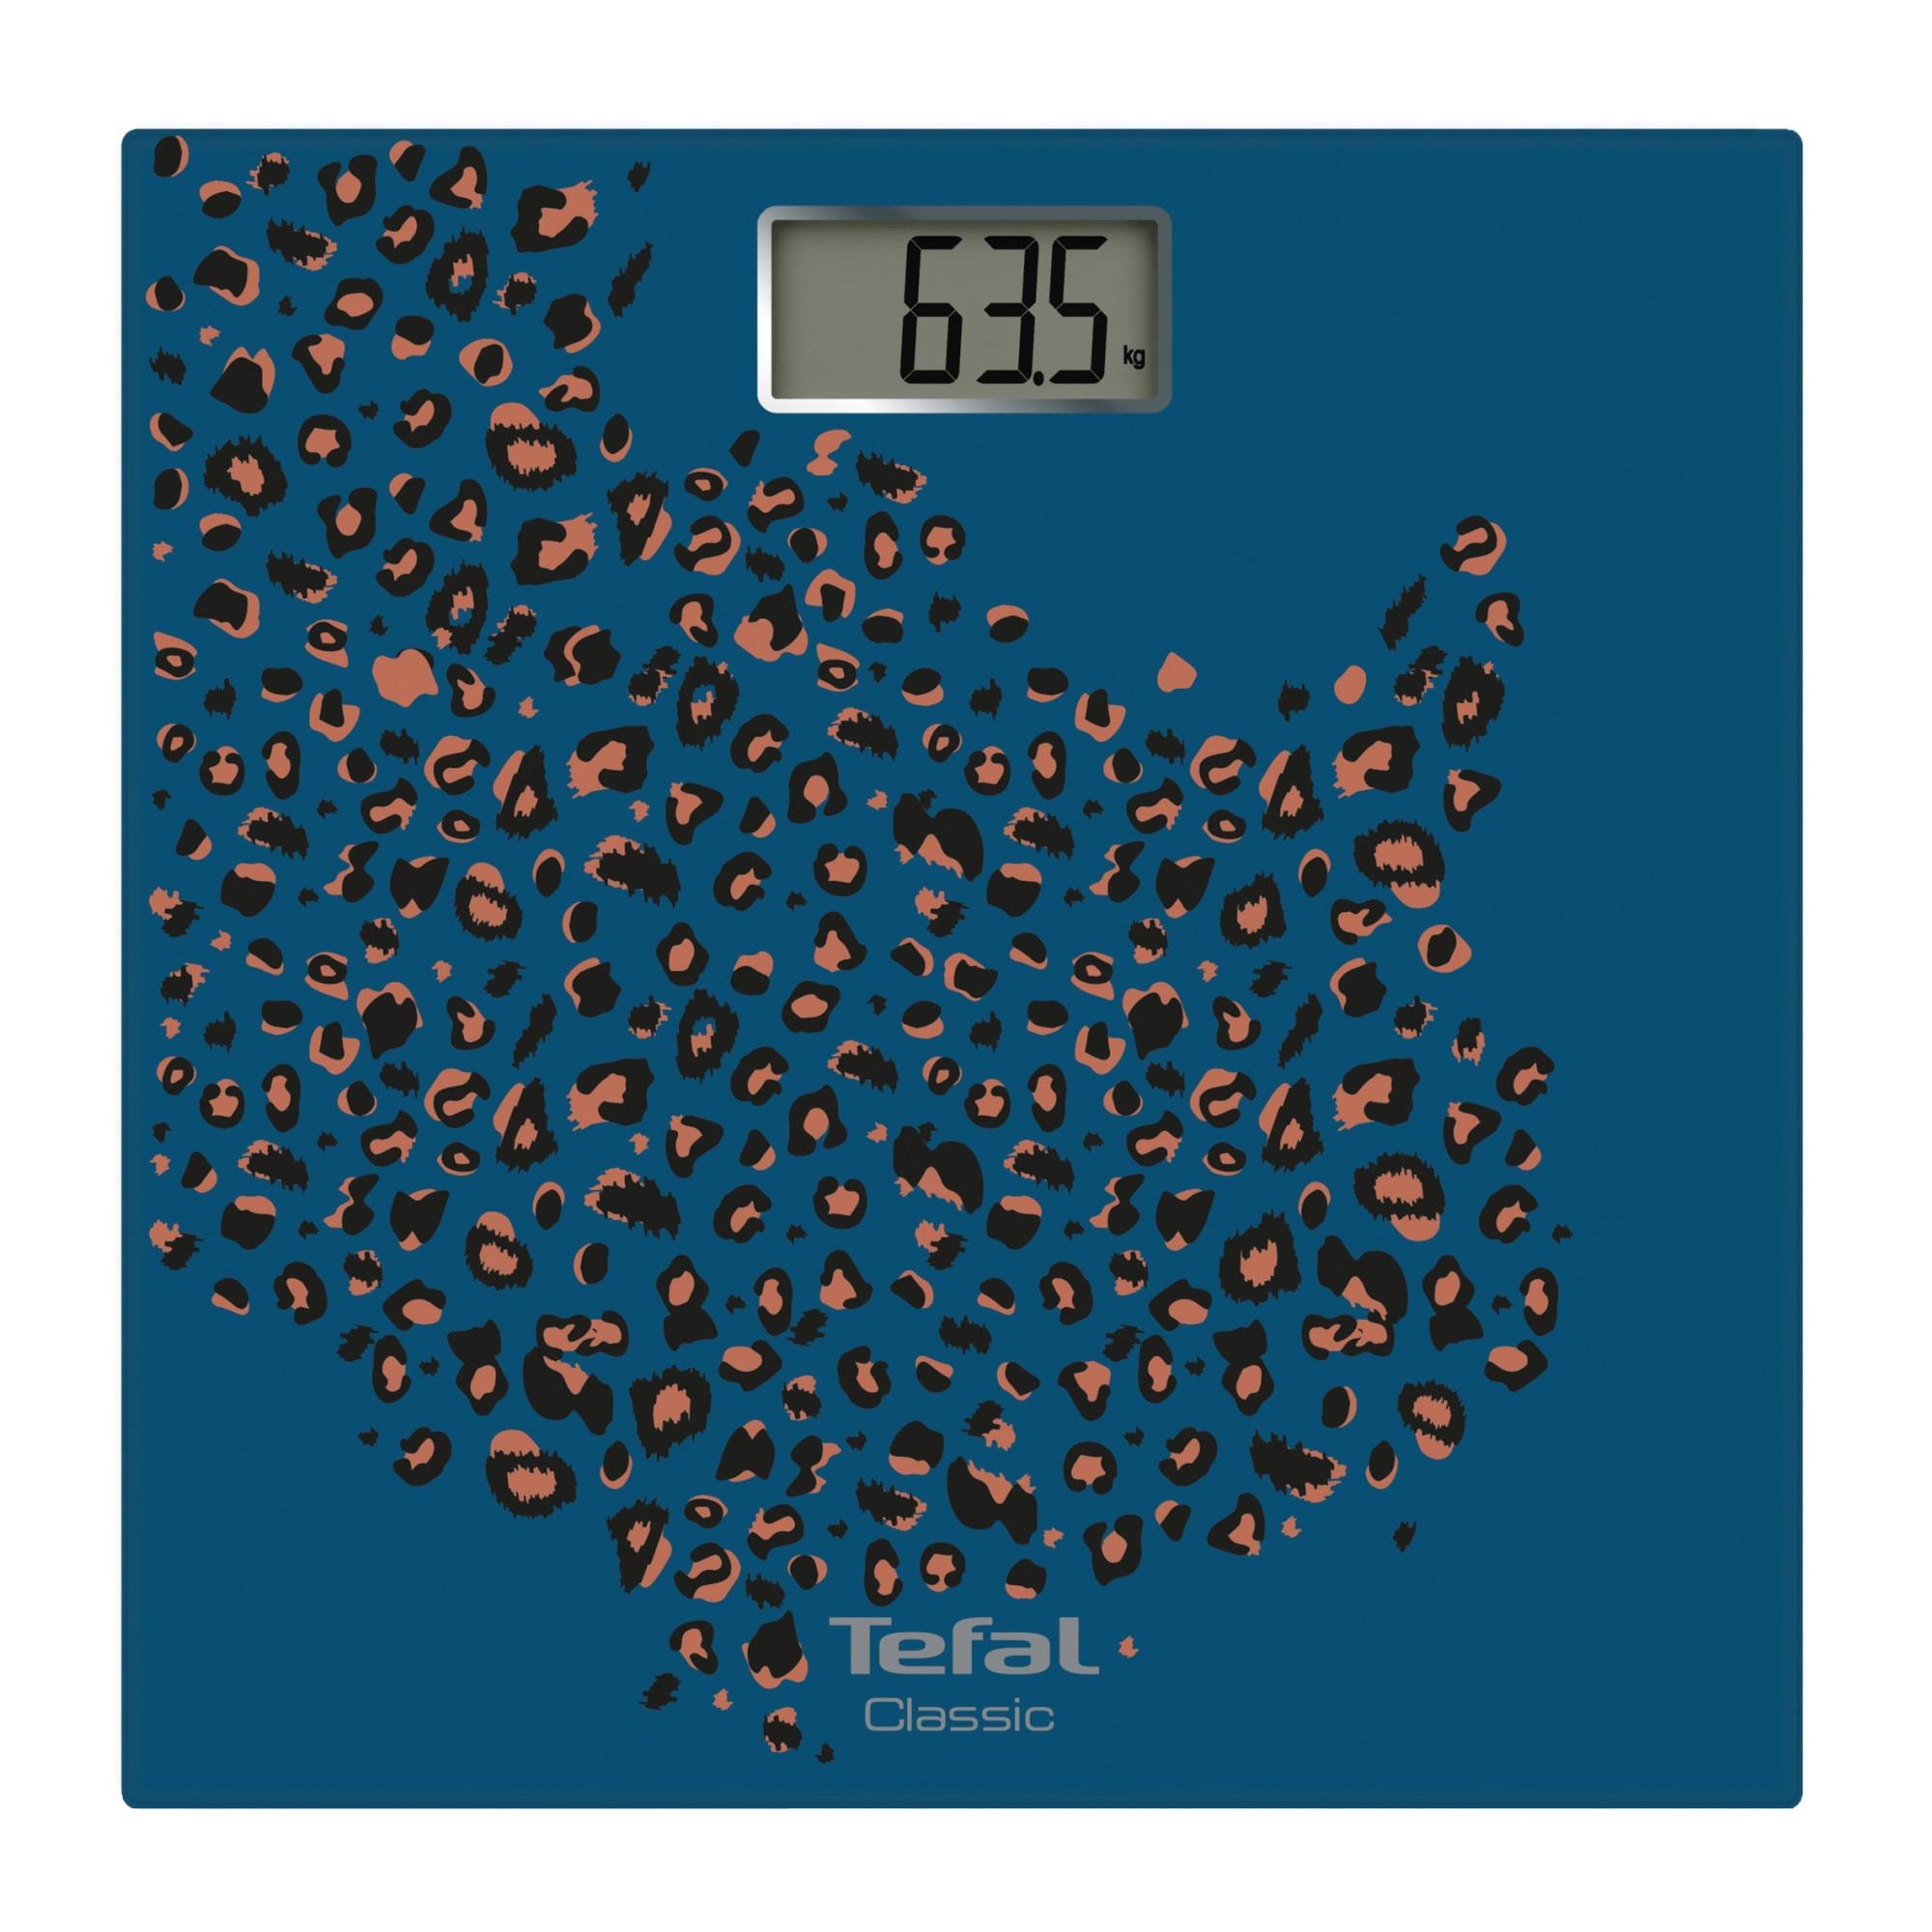 Fotografie Cantar de baie Tefal Classic Mosaic PP1154V0, capacitate 160kg, ecran LCD, platforma sticla, auto ON/OFF, albastru